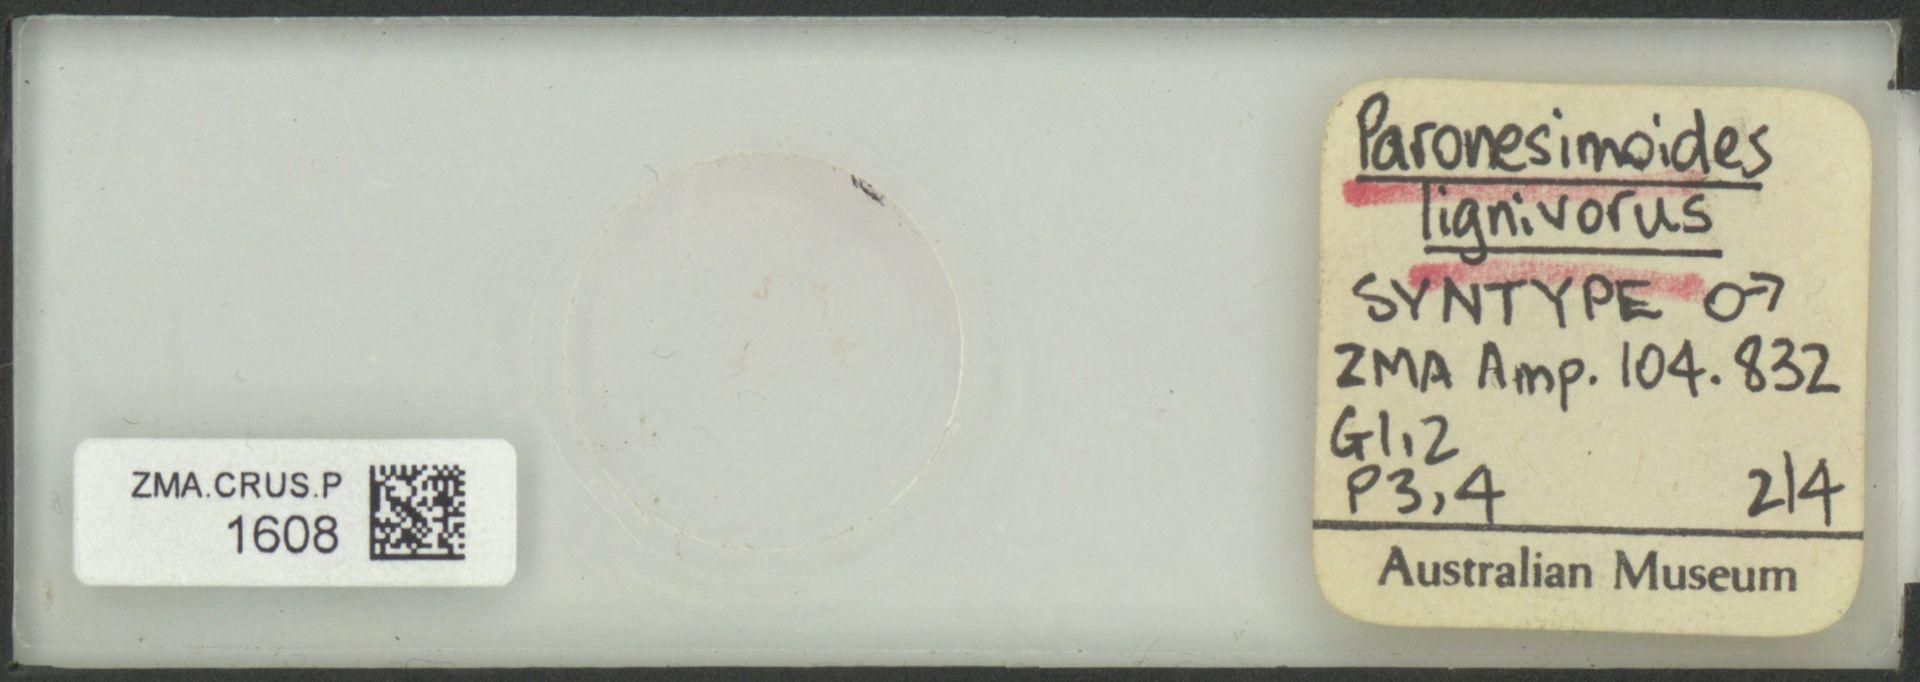 ZMA.CRUS.P.1608   Paronesimoides lignivorus